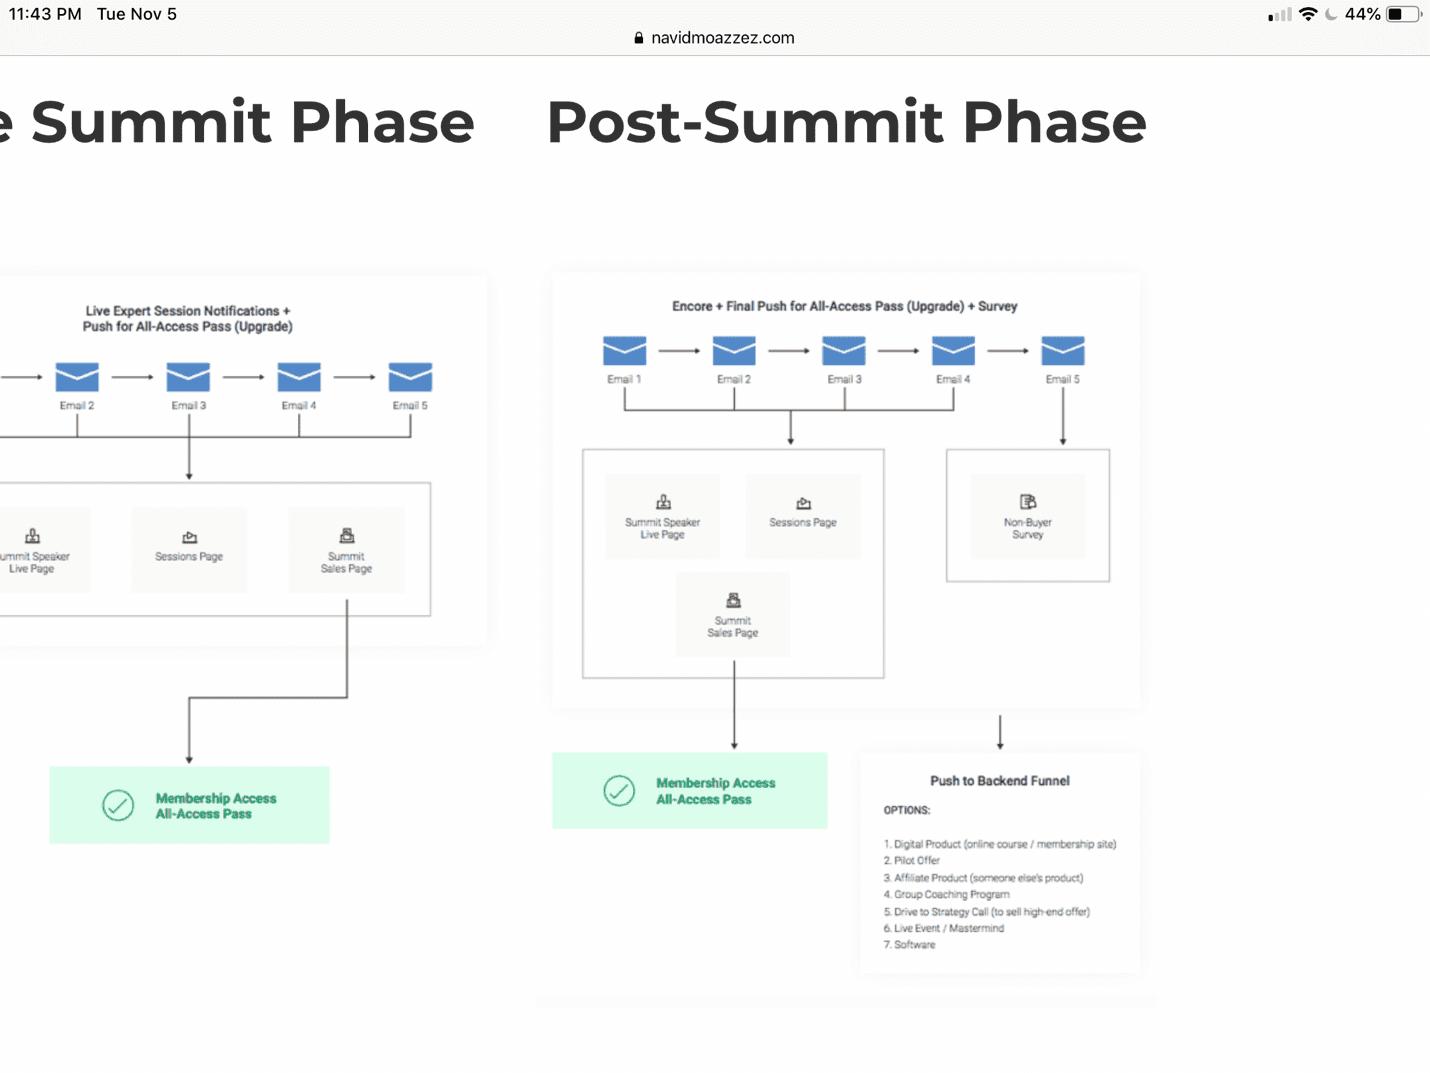 Post-Summit phase